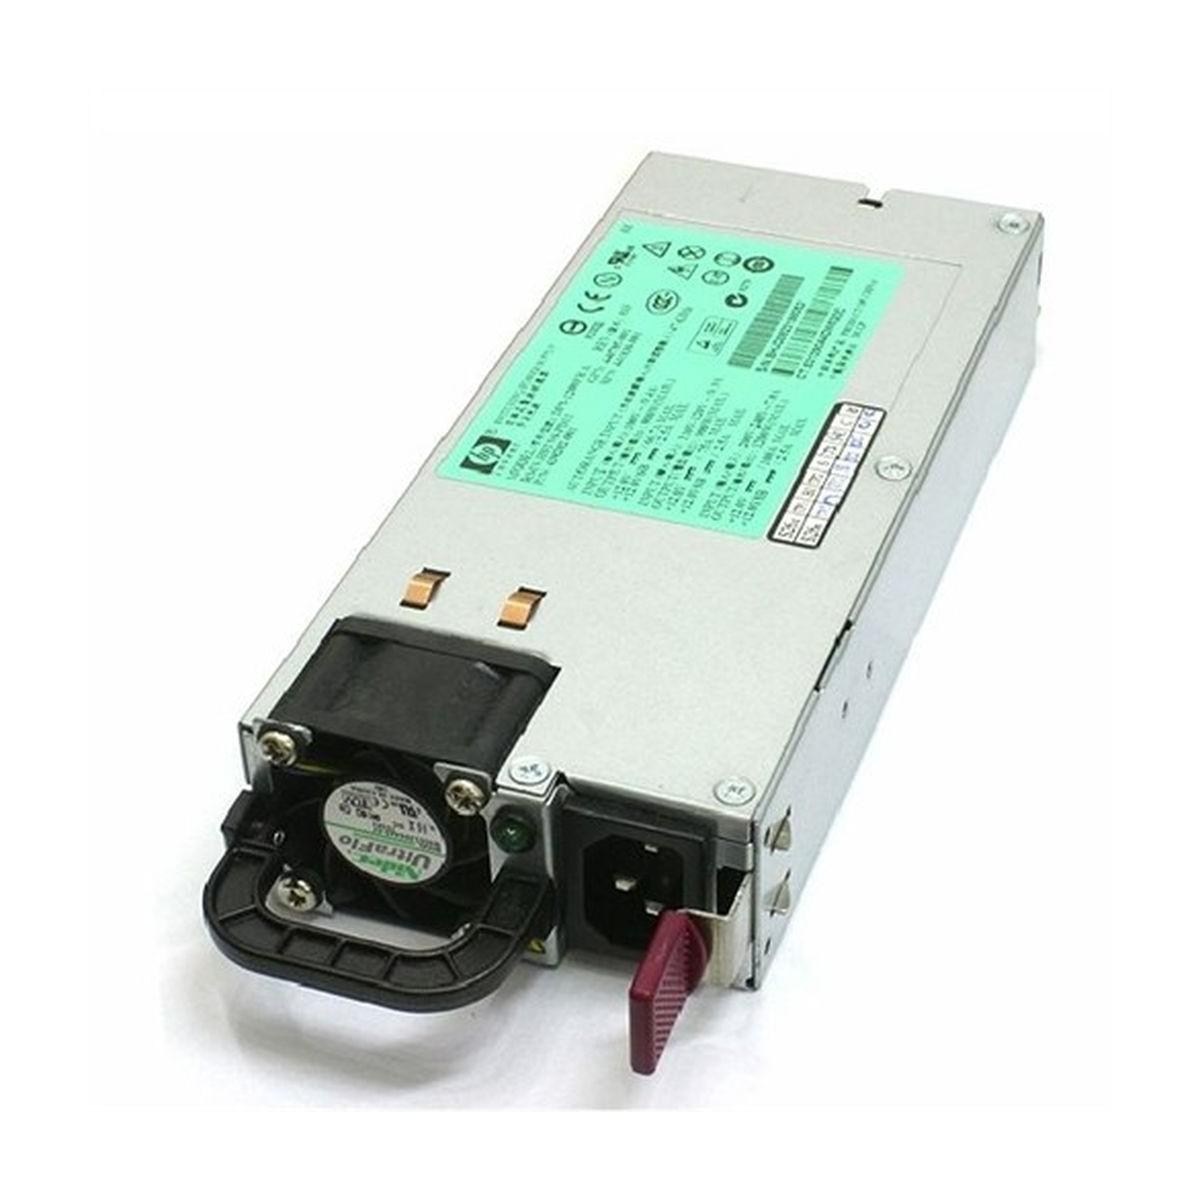 MONITOR DELL U2415 24,1'' IPS LED HDMI DP USB 3.0